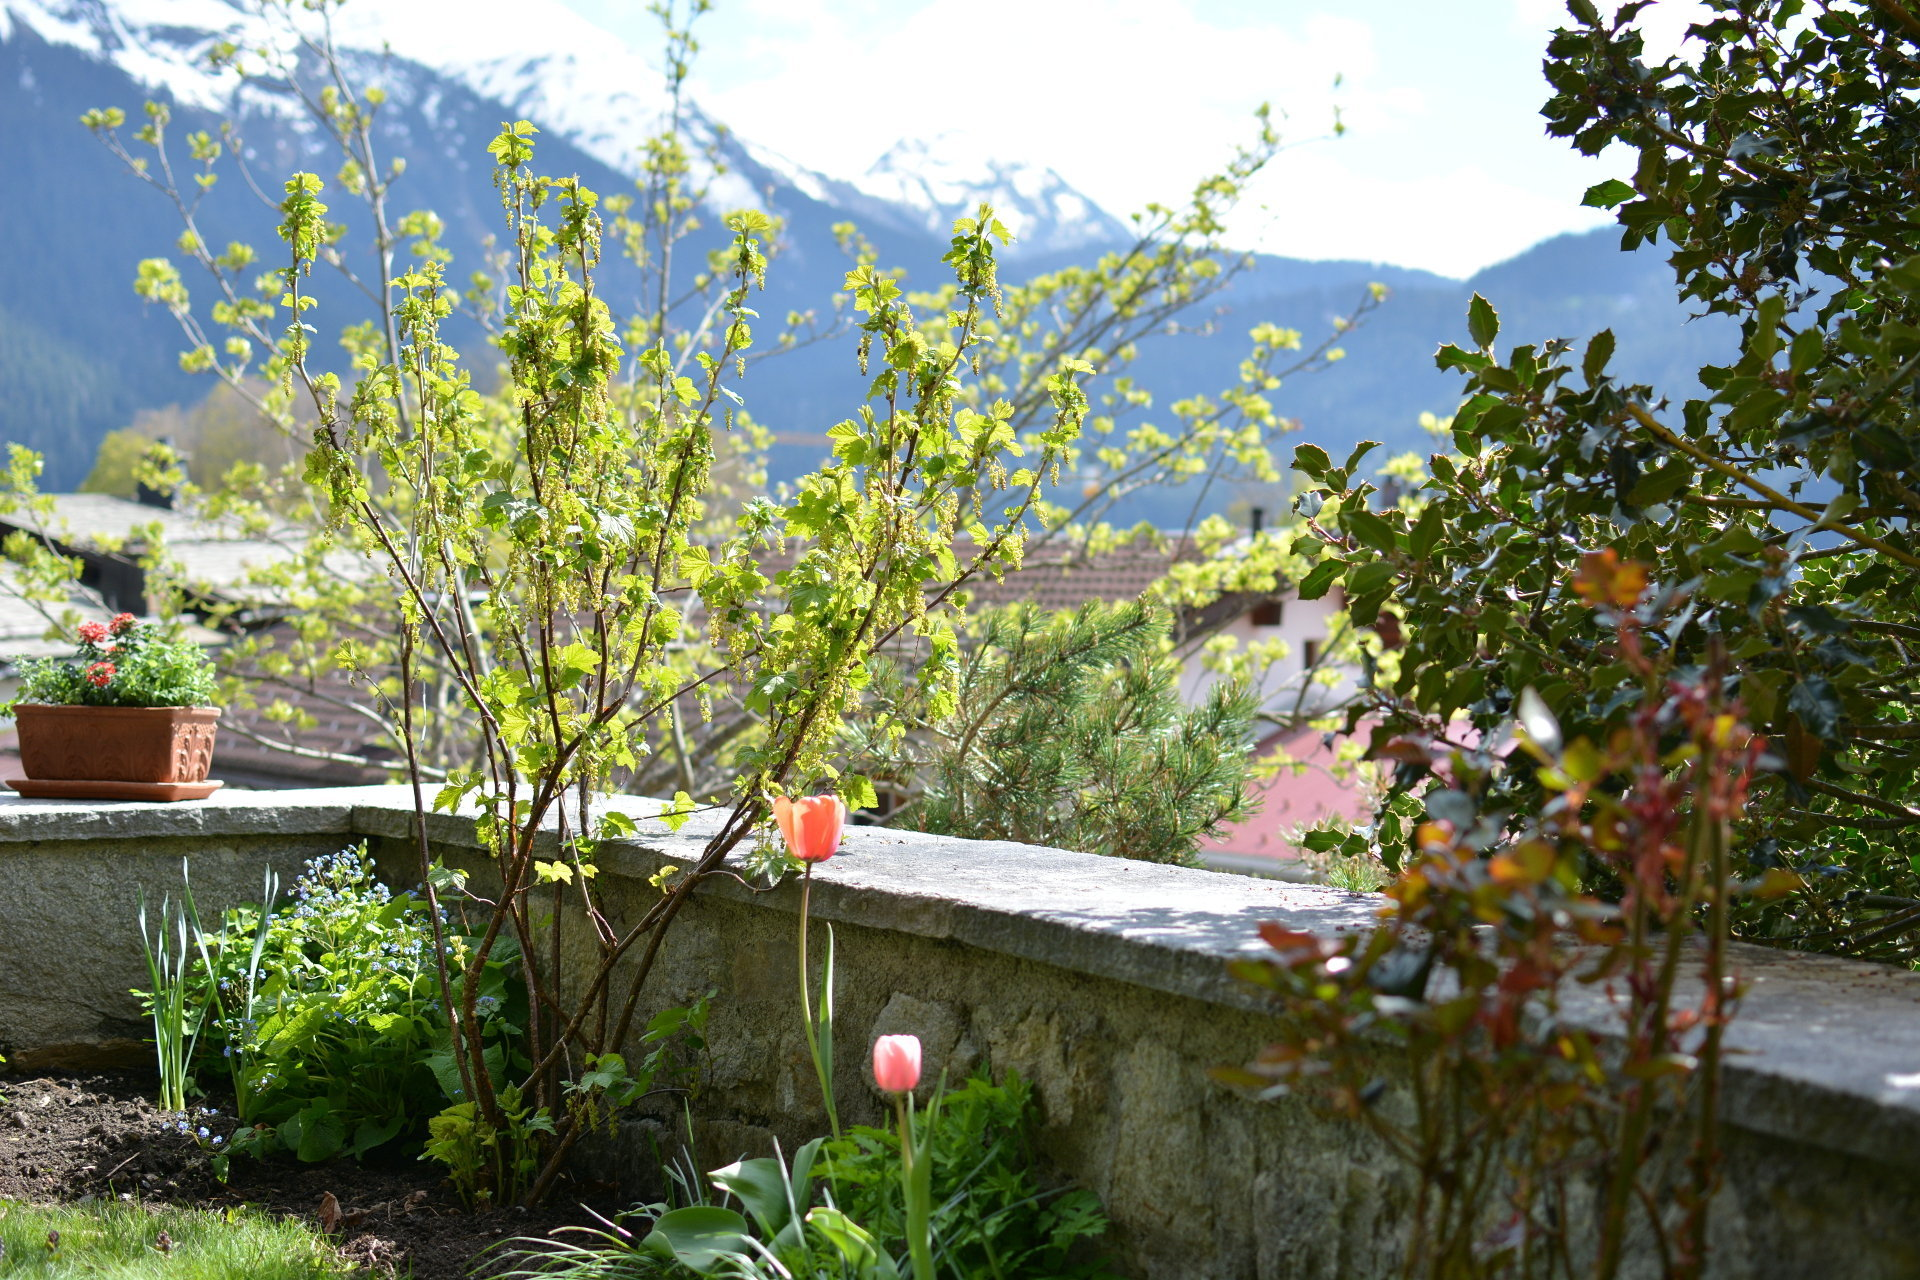 Chalet-Fuechsli-Klosters-Sommer-10.JPG